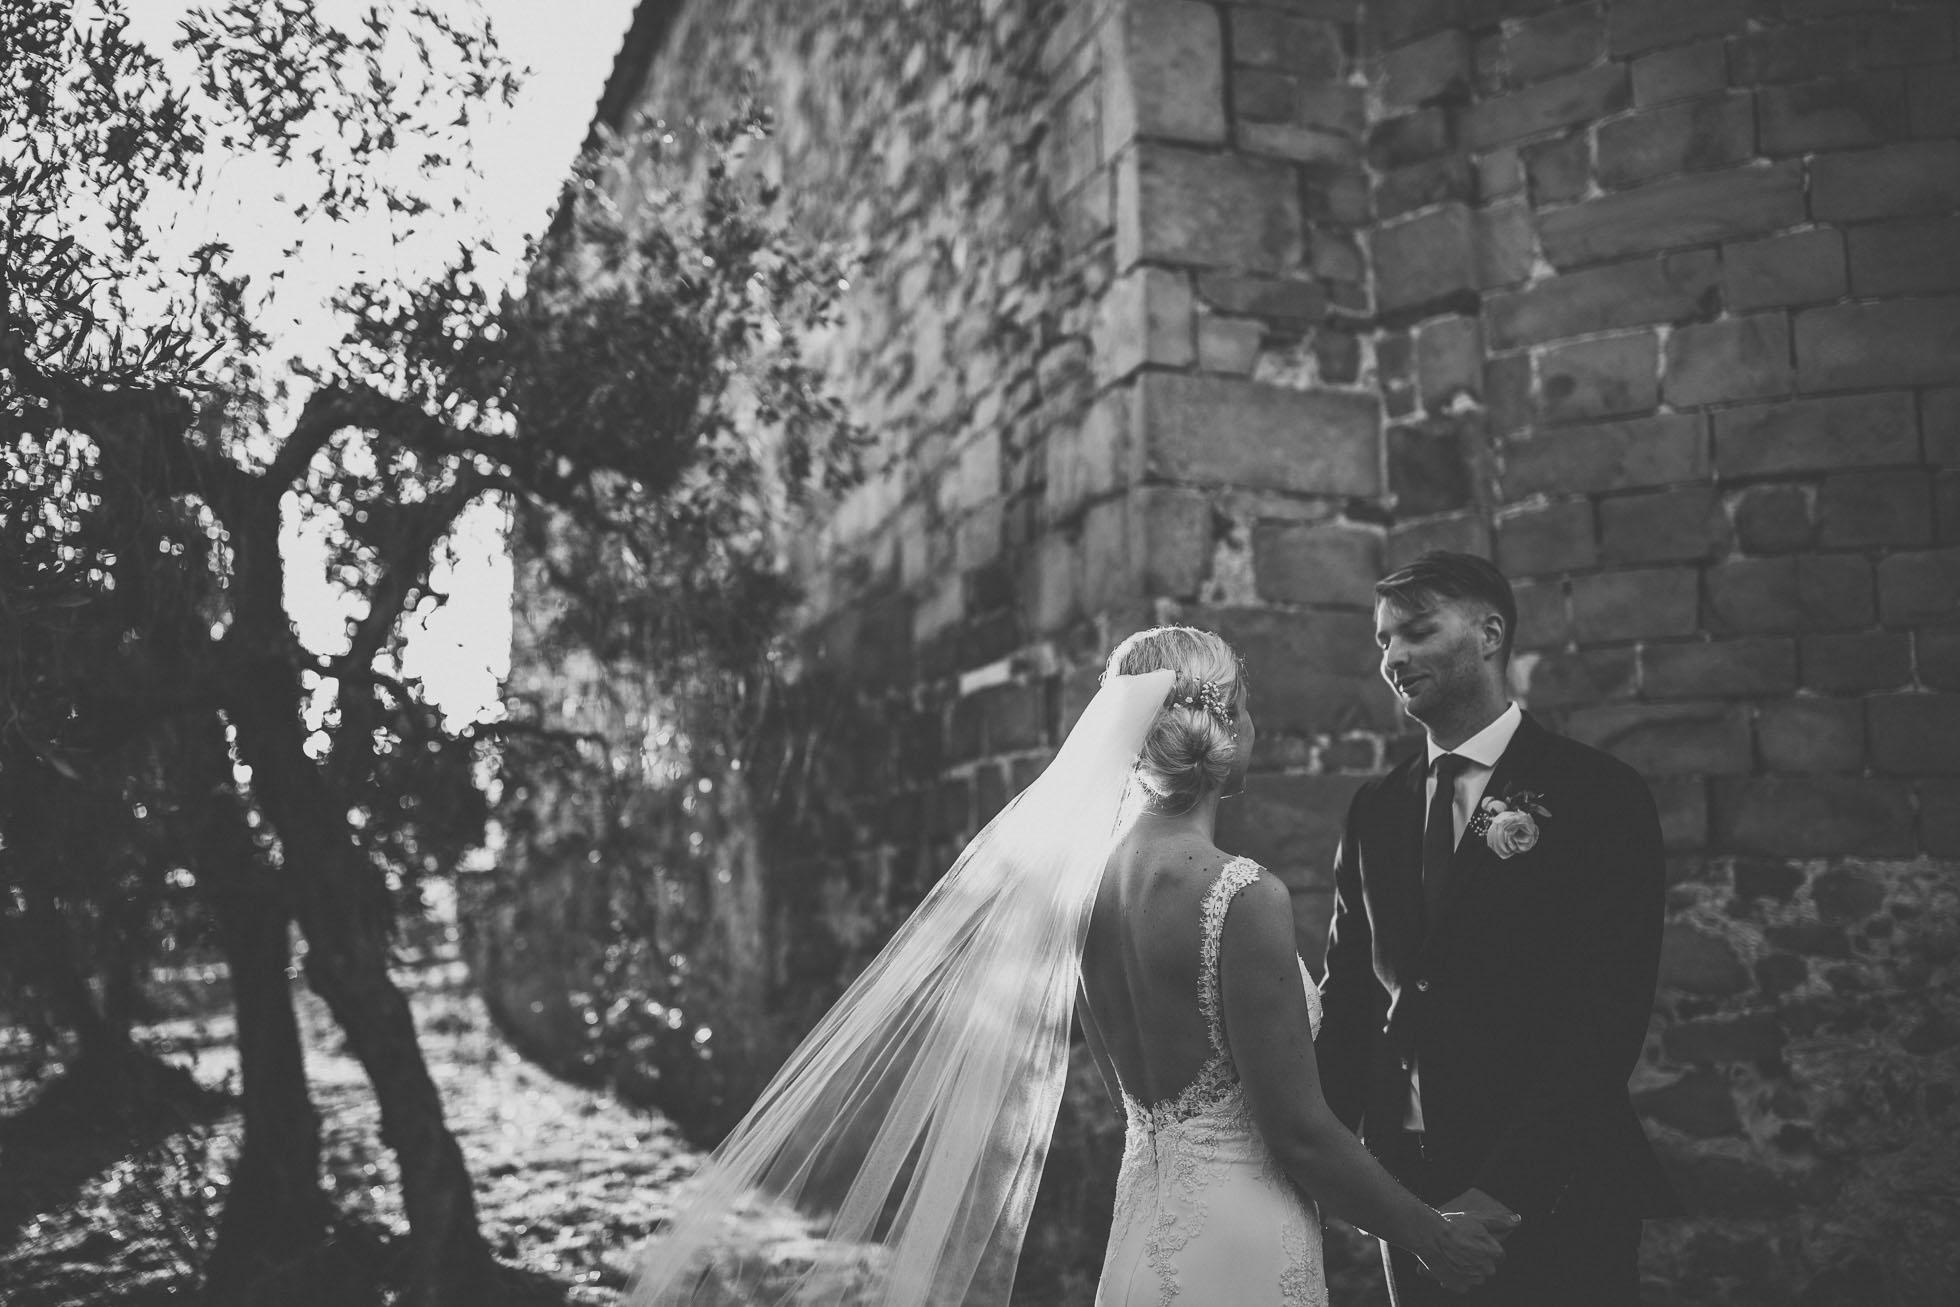 tenuta_san_pietro_wedding_photographer-67.jpg